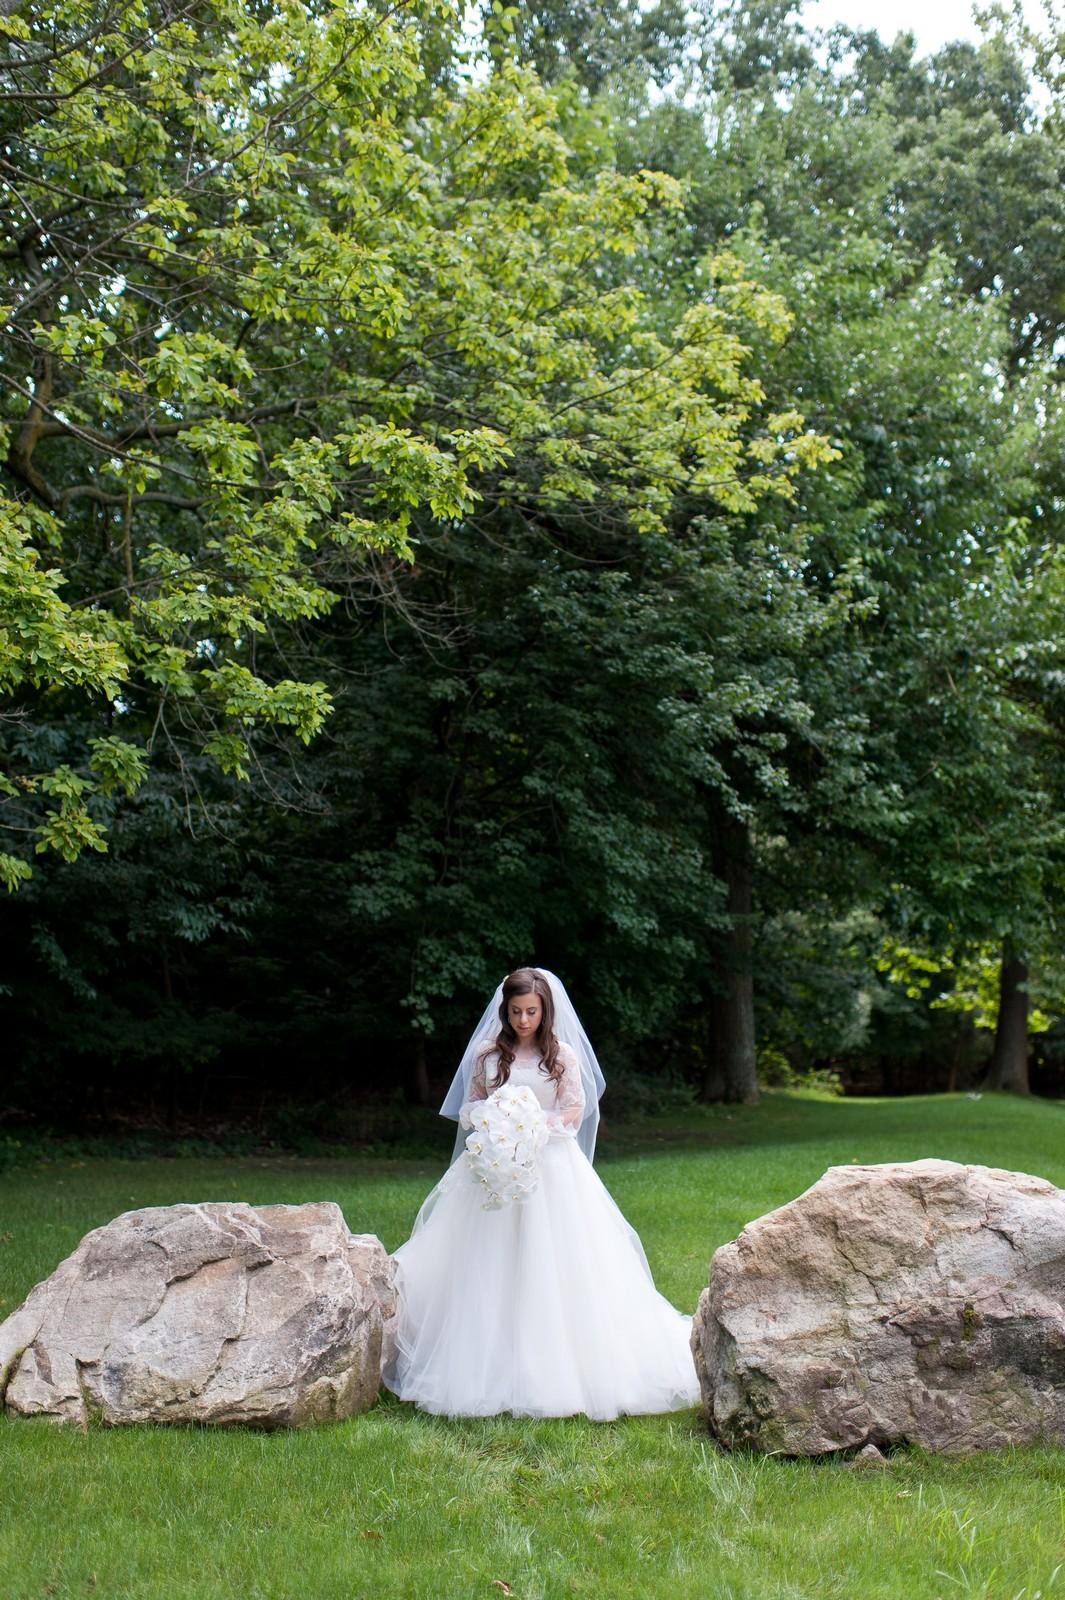 Josh and Michelle's Modern Jewish Wedding at Congregation Keter Torah, Teaneck, New Jersey Photos by Chaim Schvarcz, Bride Portraits